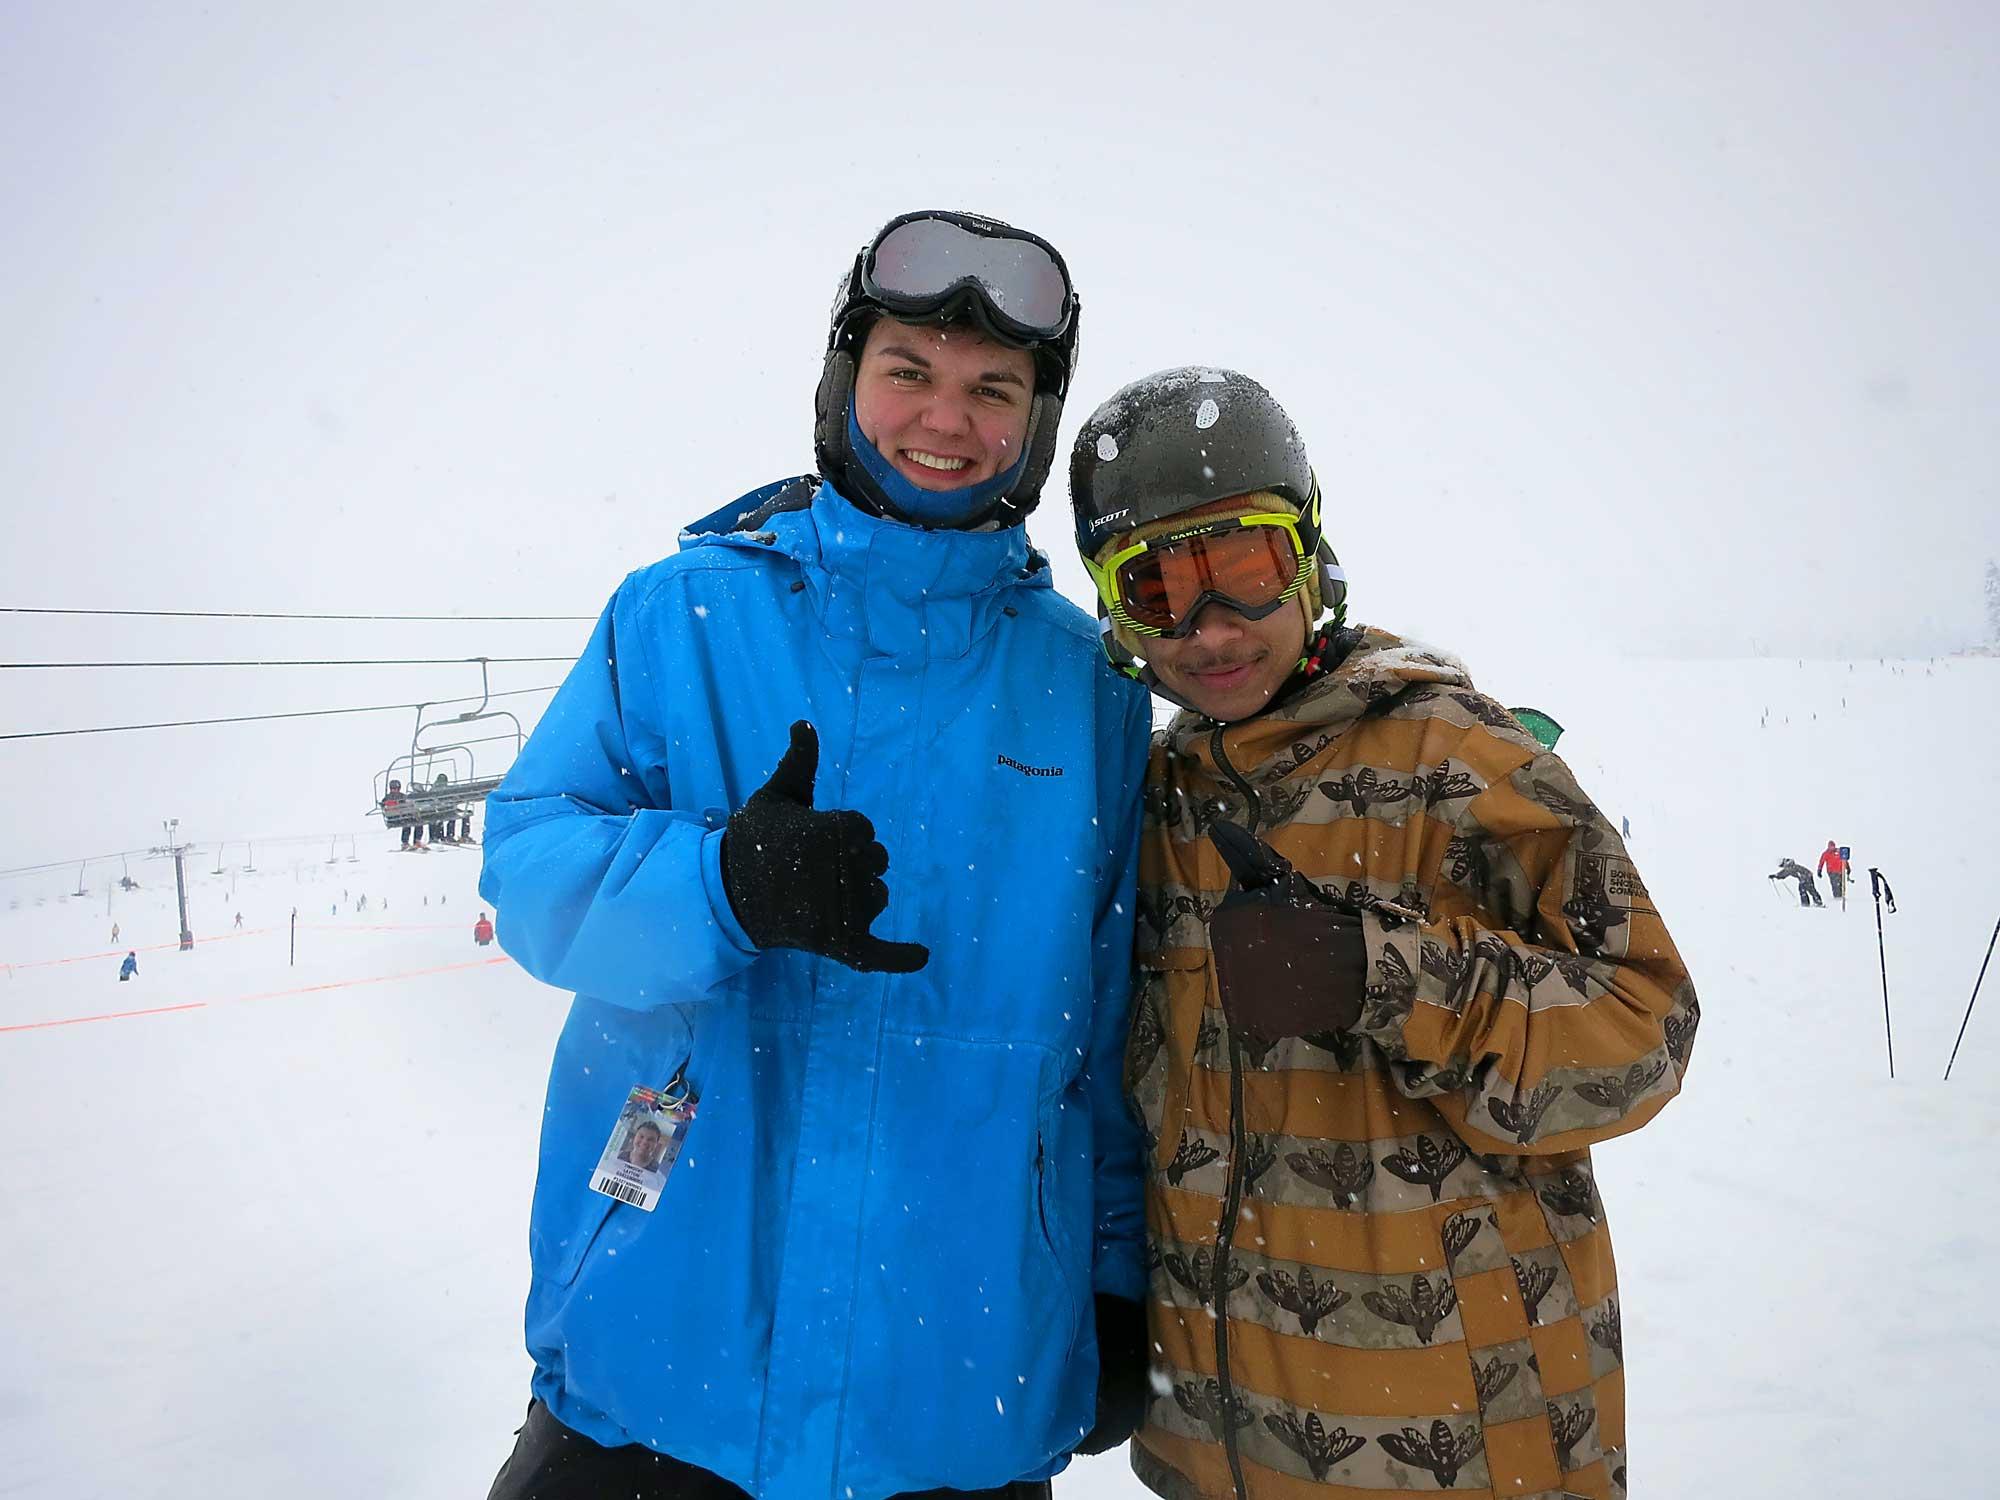 Tim Layton Shines as tSB Snowboard Instructor!